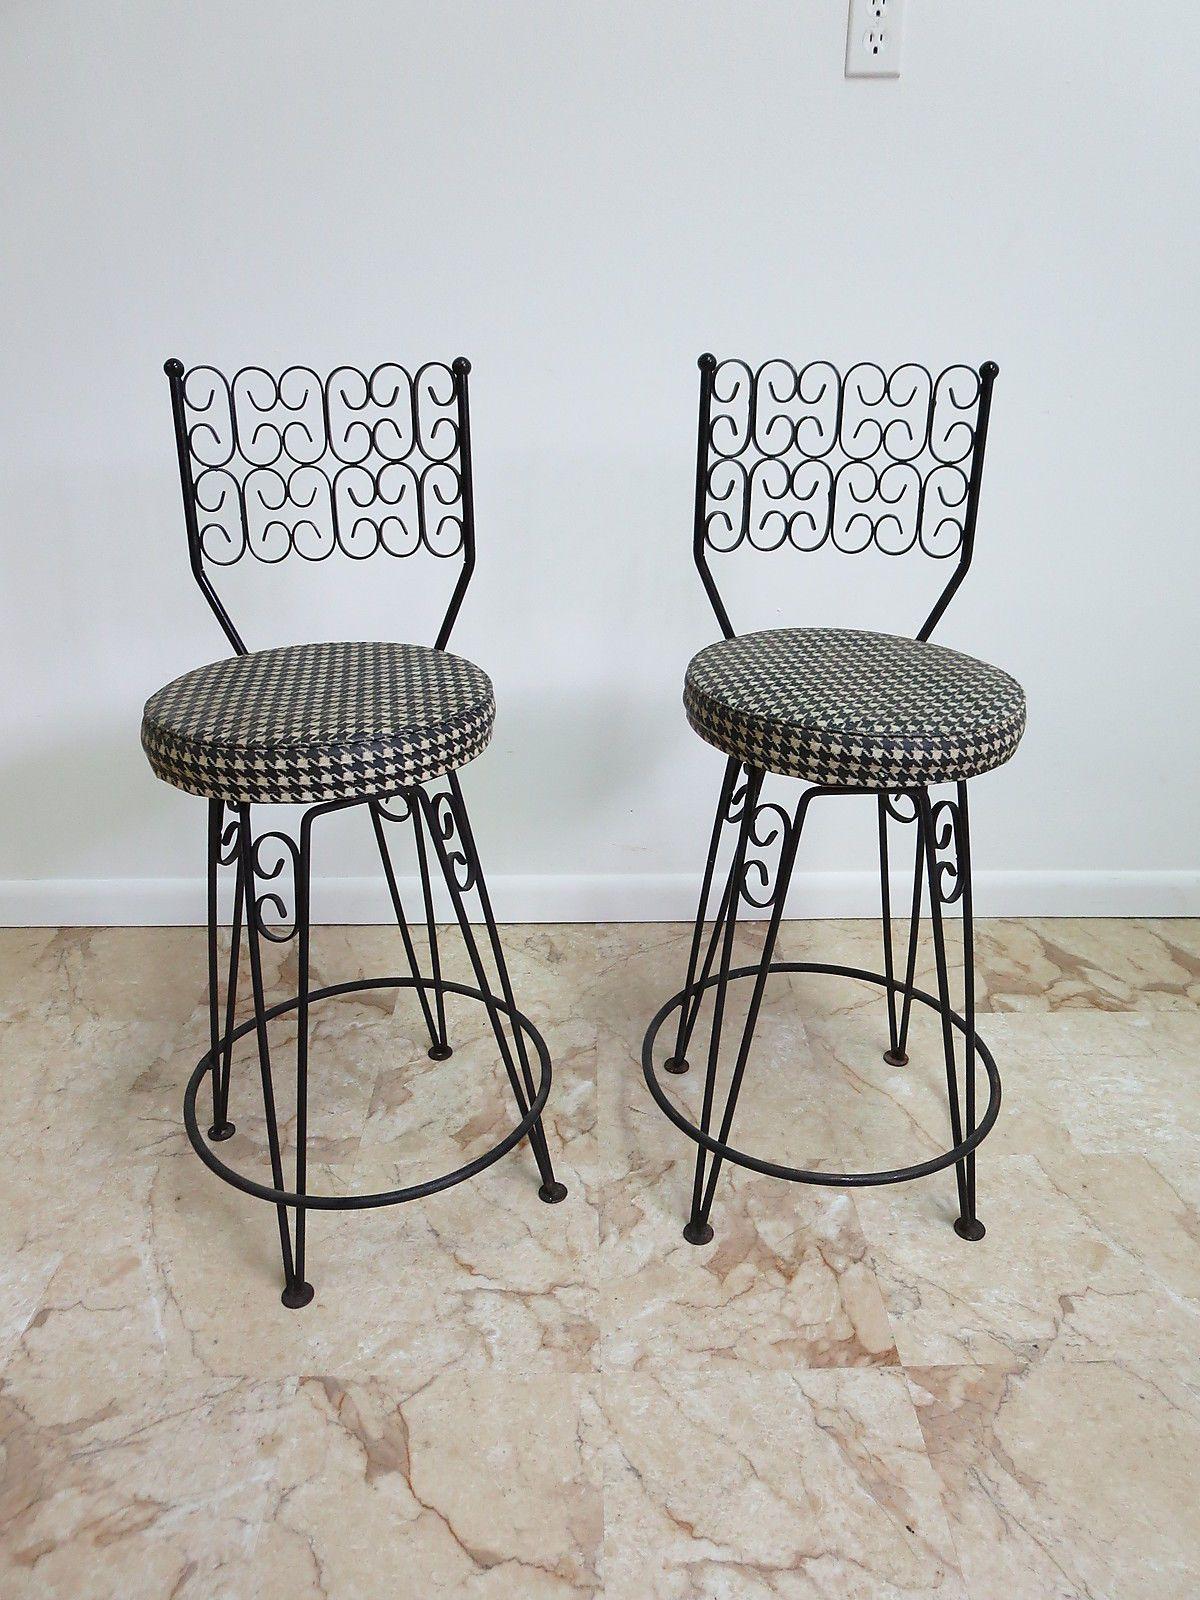 check used stools stool modern pin ebay furniture bar more at classic